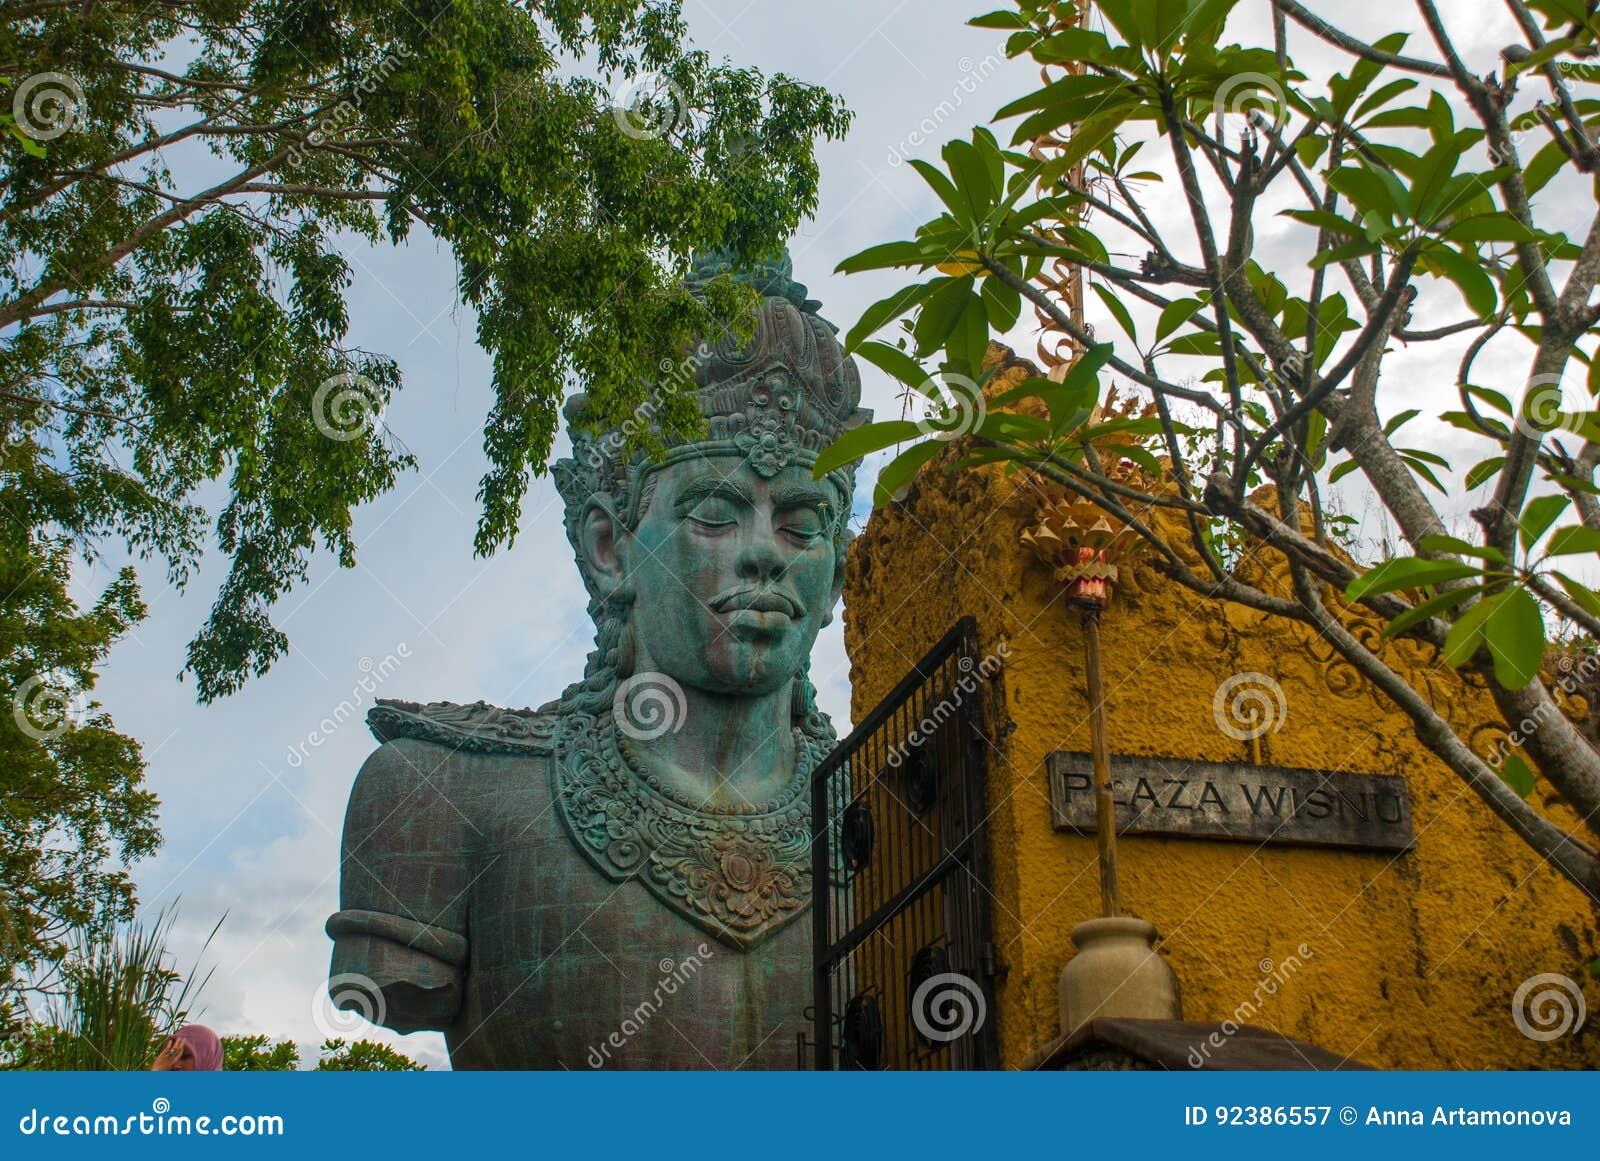 Garuda Wisnu Kencana Cultural Park Huge Sculpture Of Vishnu Statue